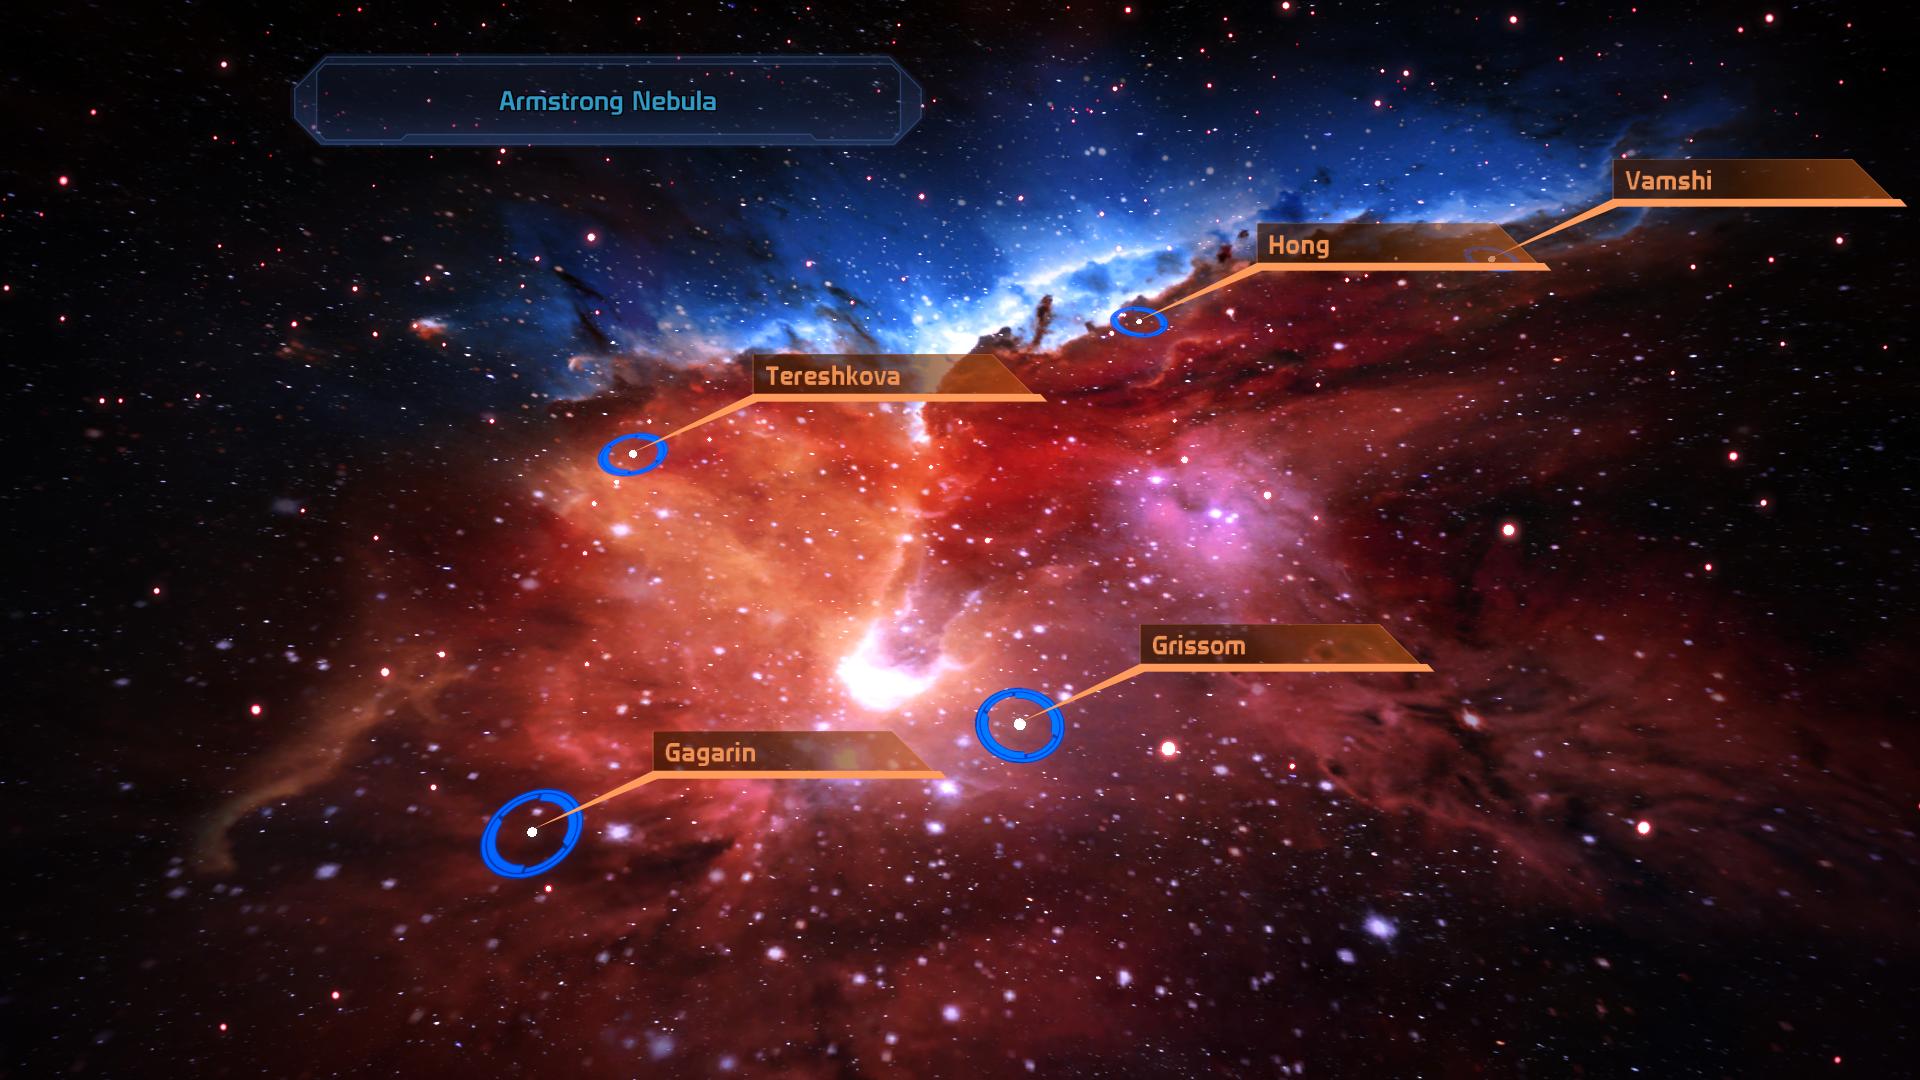 Armstrong Nebula | Mass Effect Wiki | FANDOM powered by Wikia